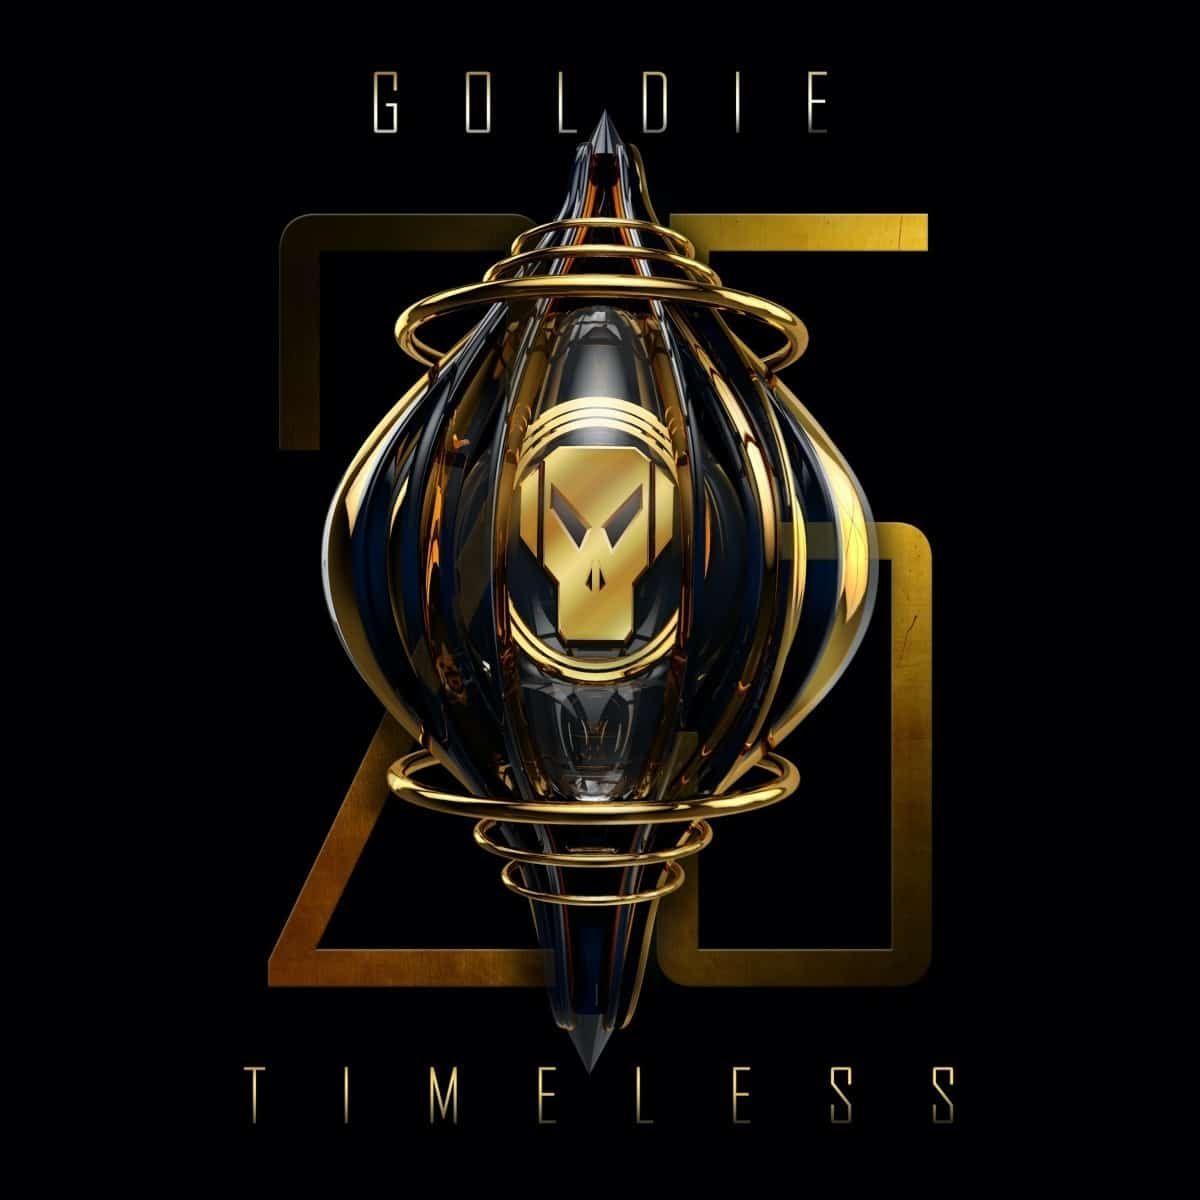 Goldie - Timeless - 3LP